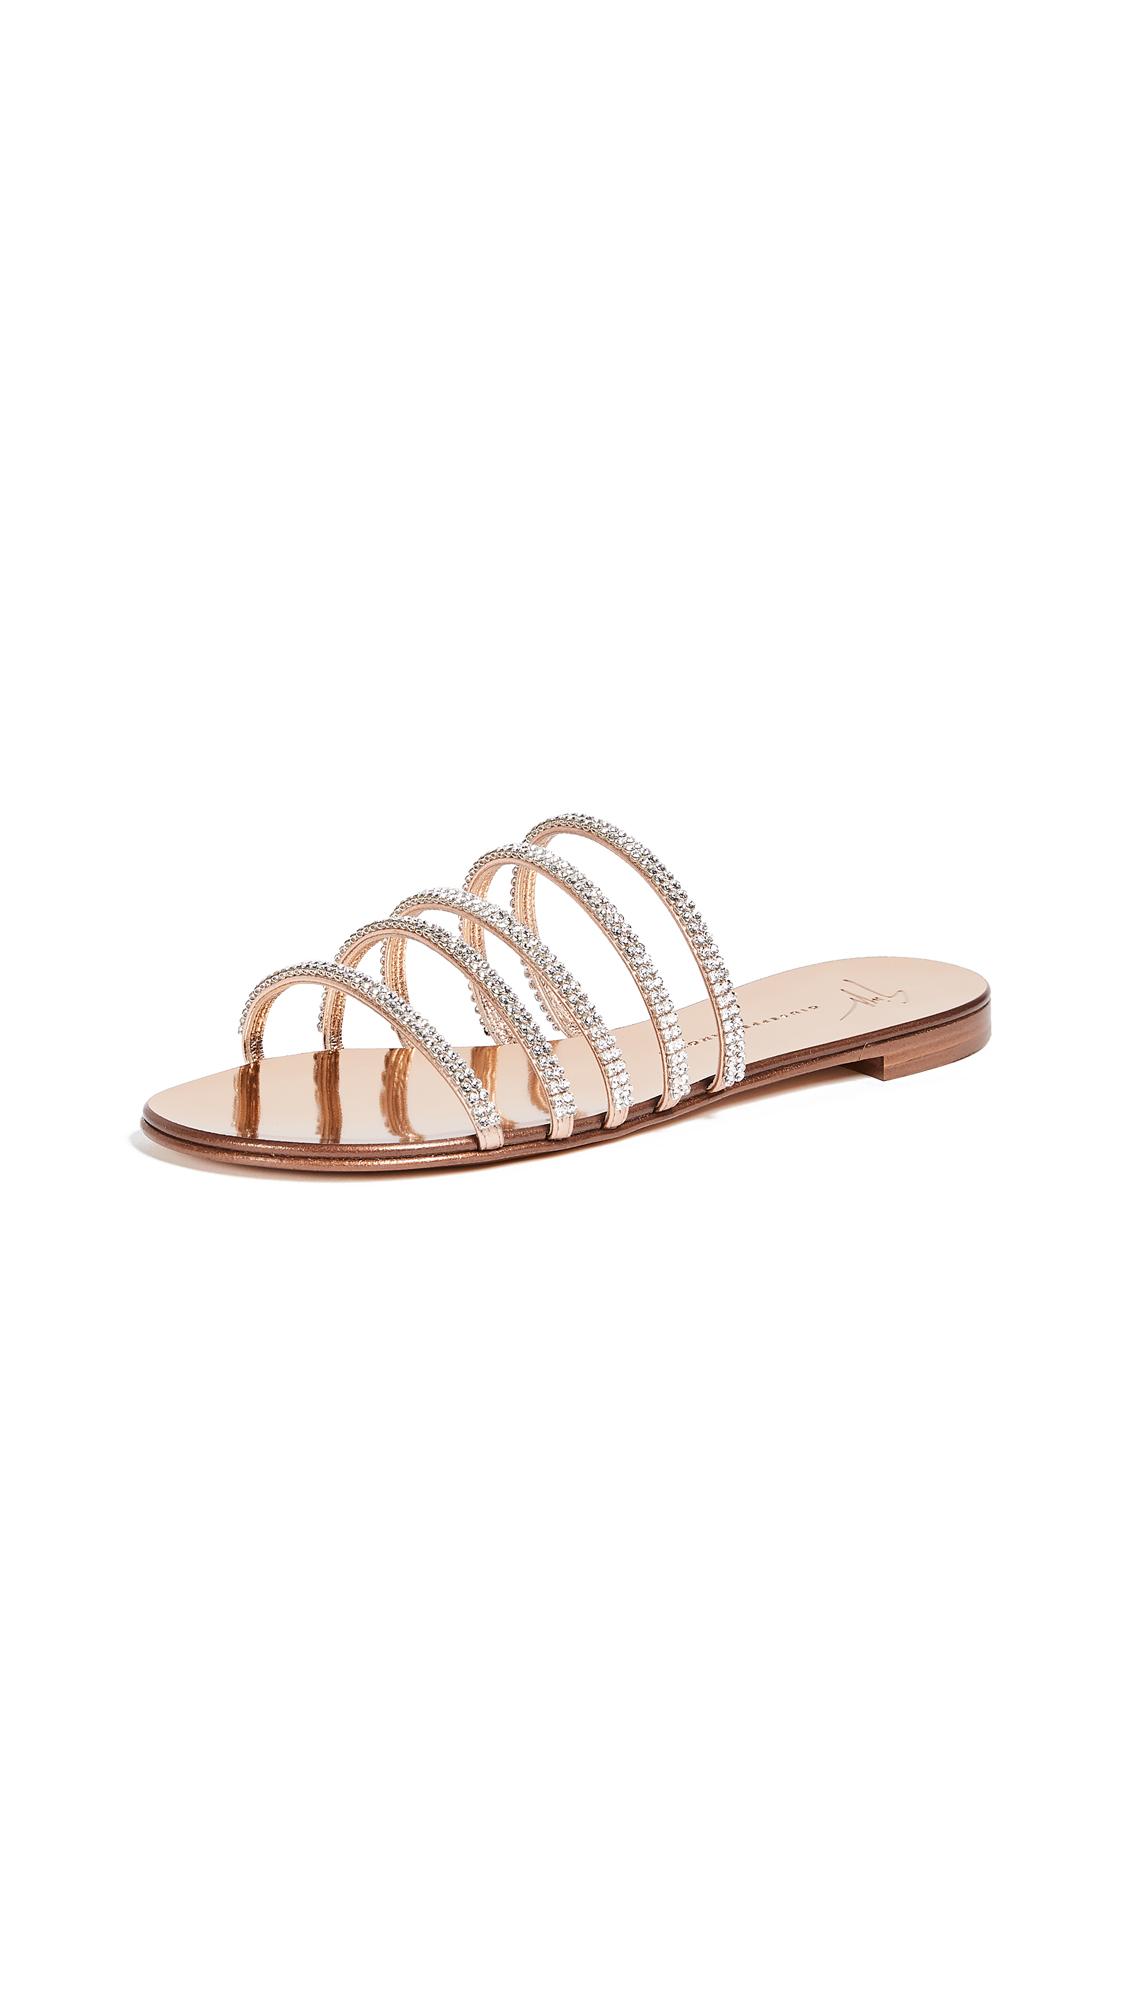 Giuseppe Zanotti Multi Strap Flat Sandals - Ramino